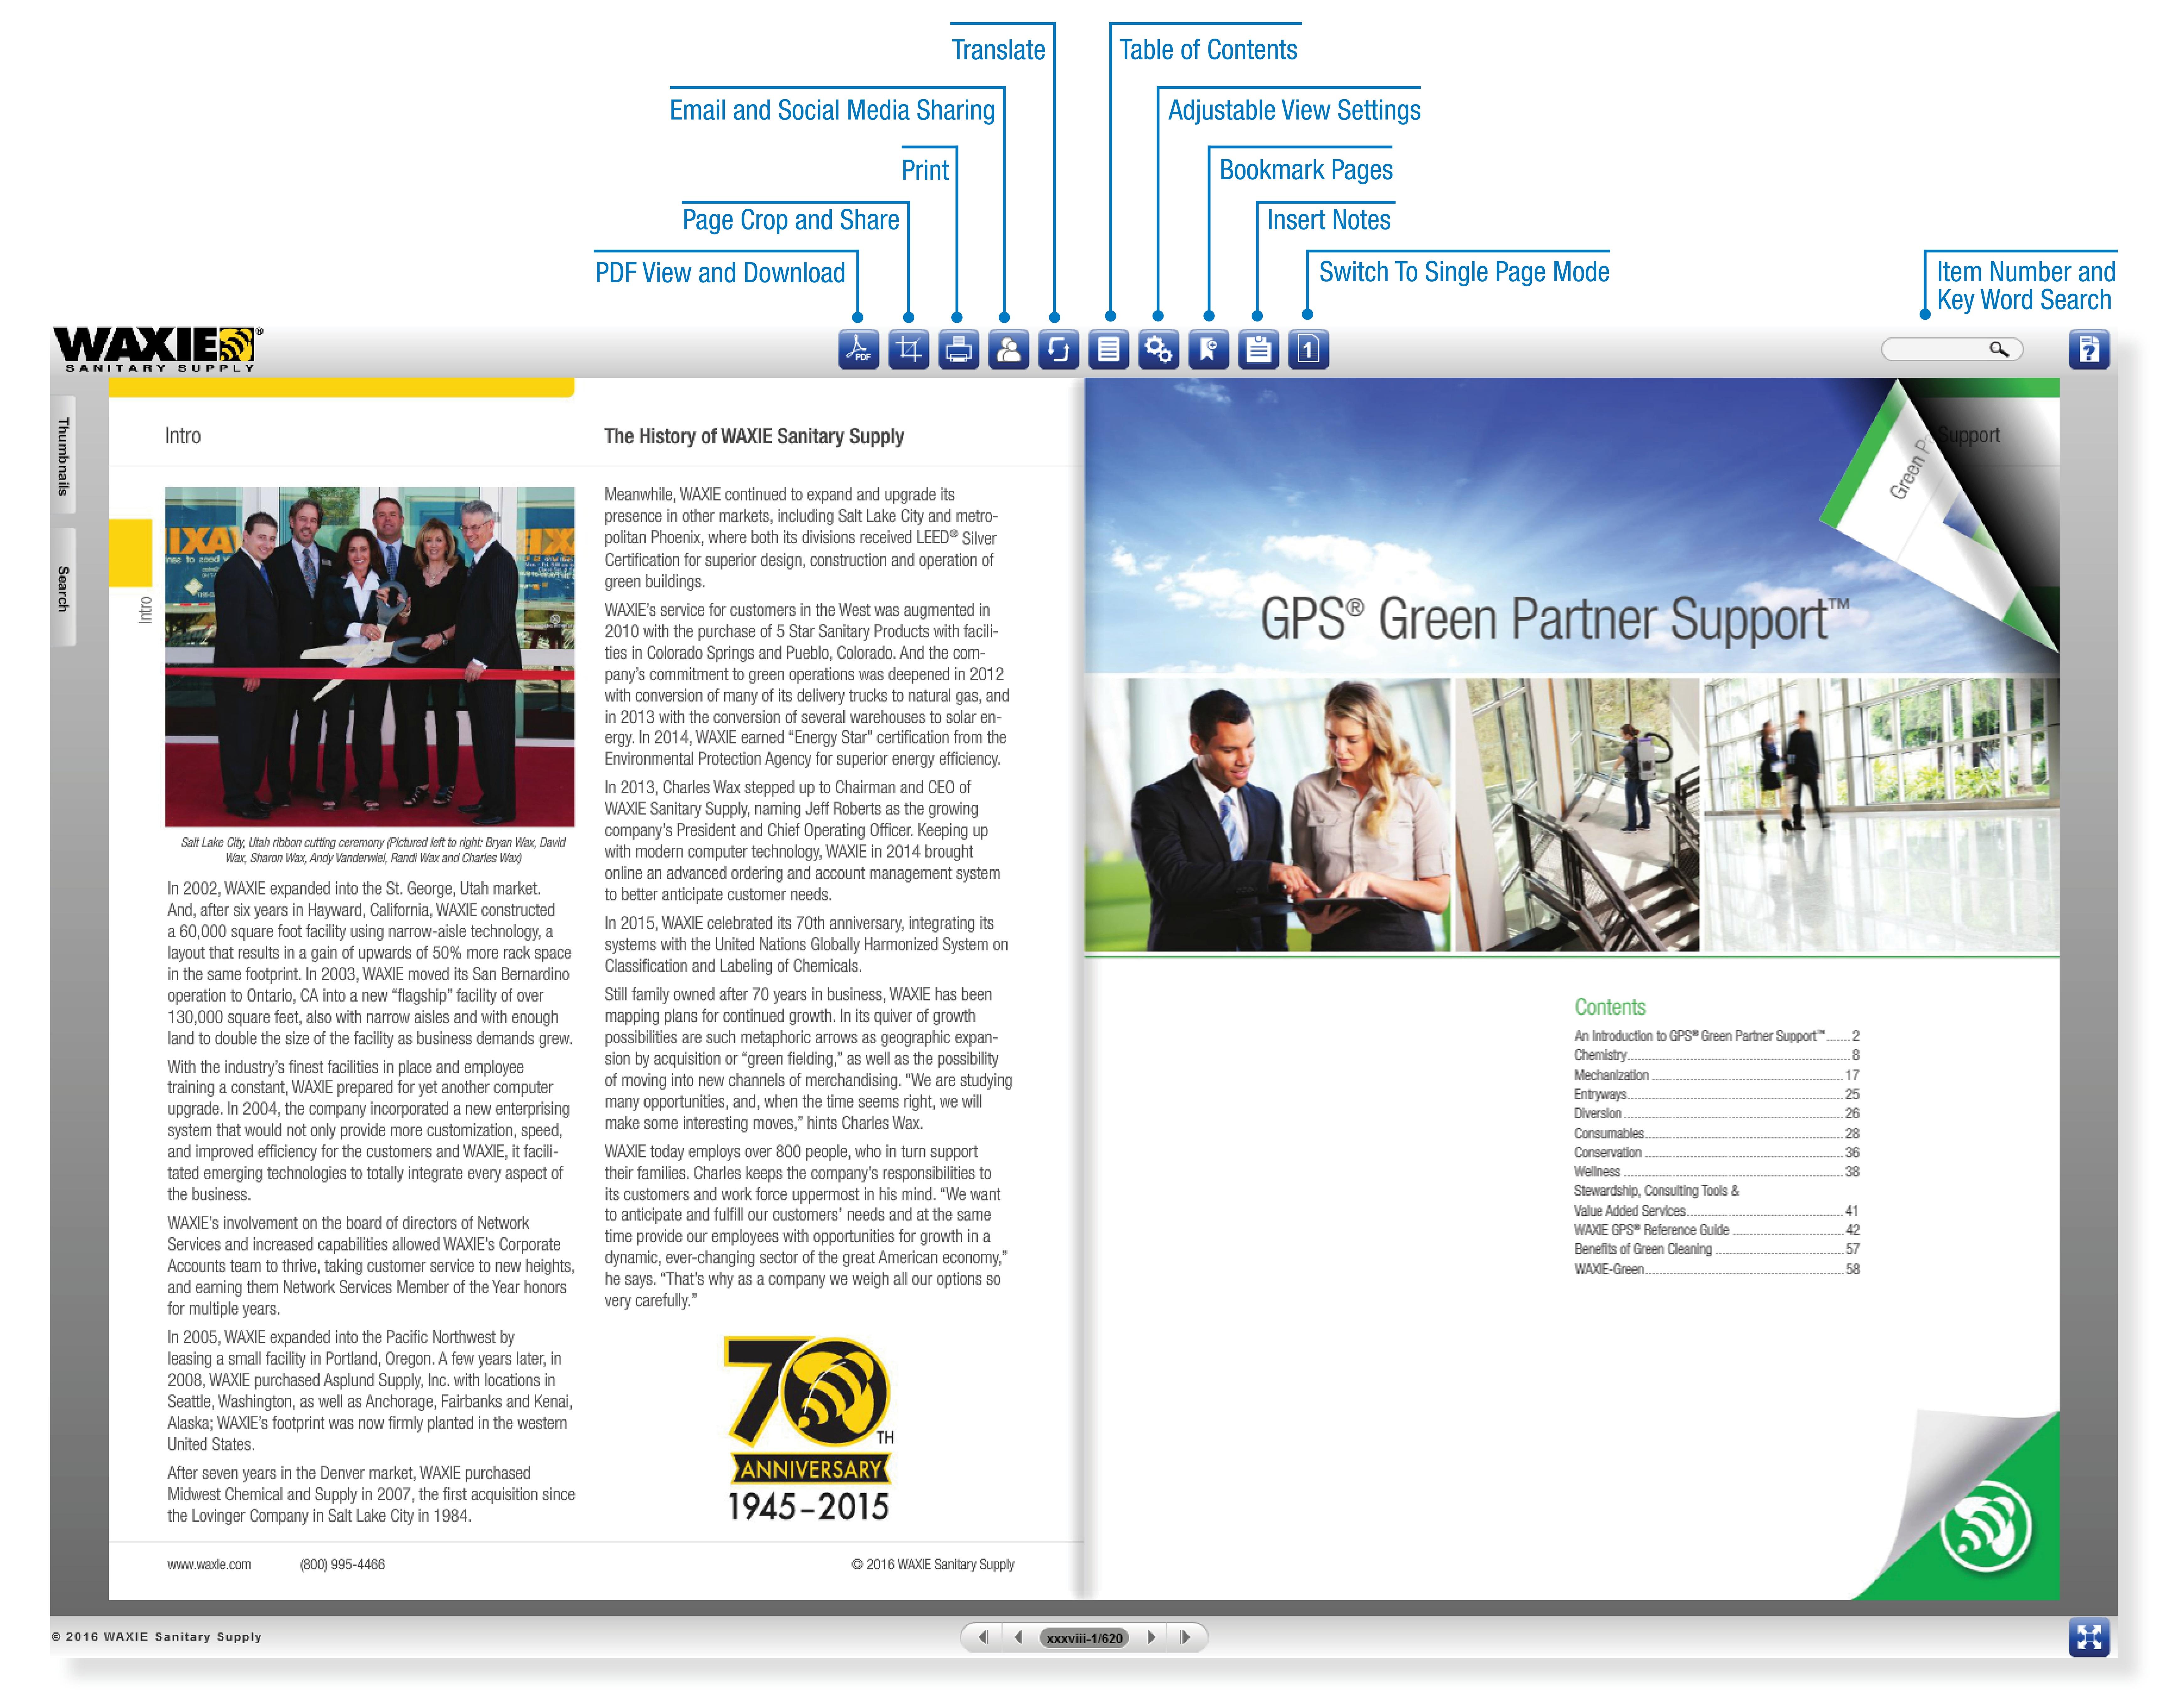 WAXIE-flipbook-graphic-640.jpg